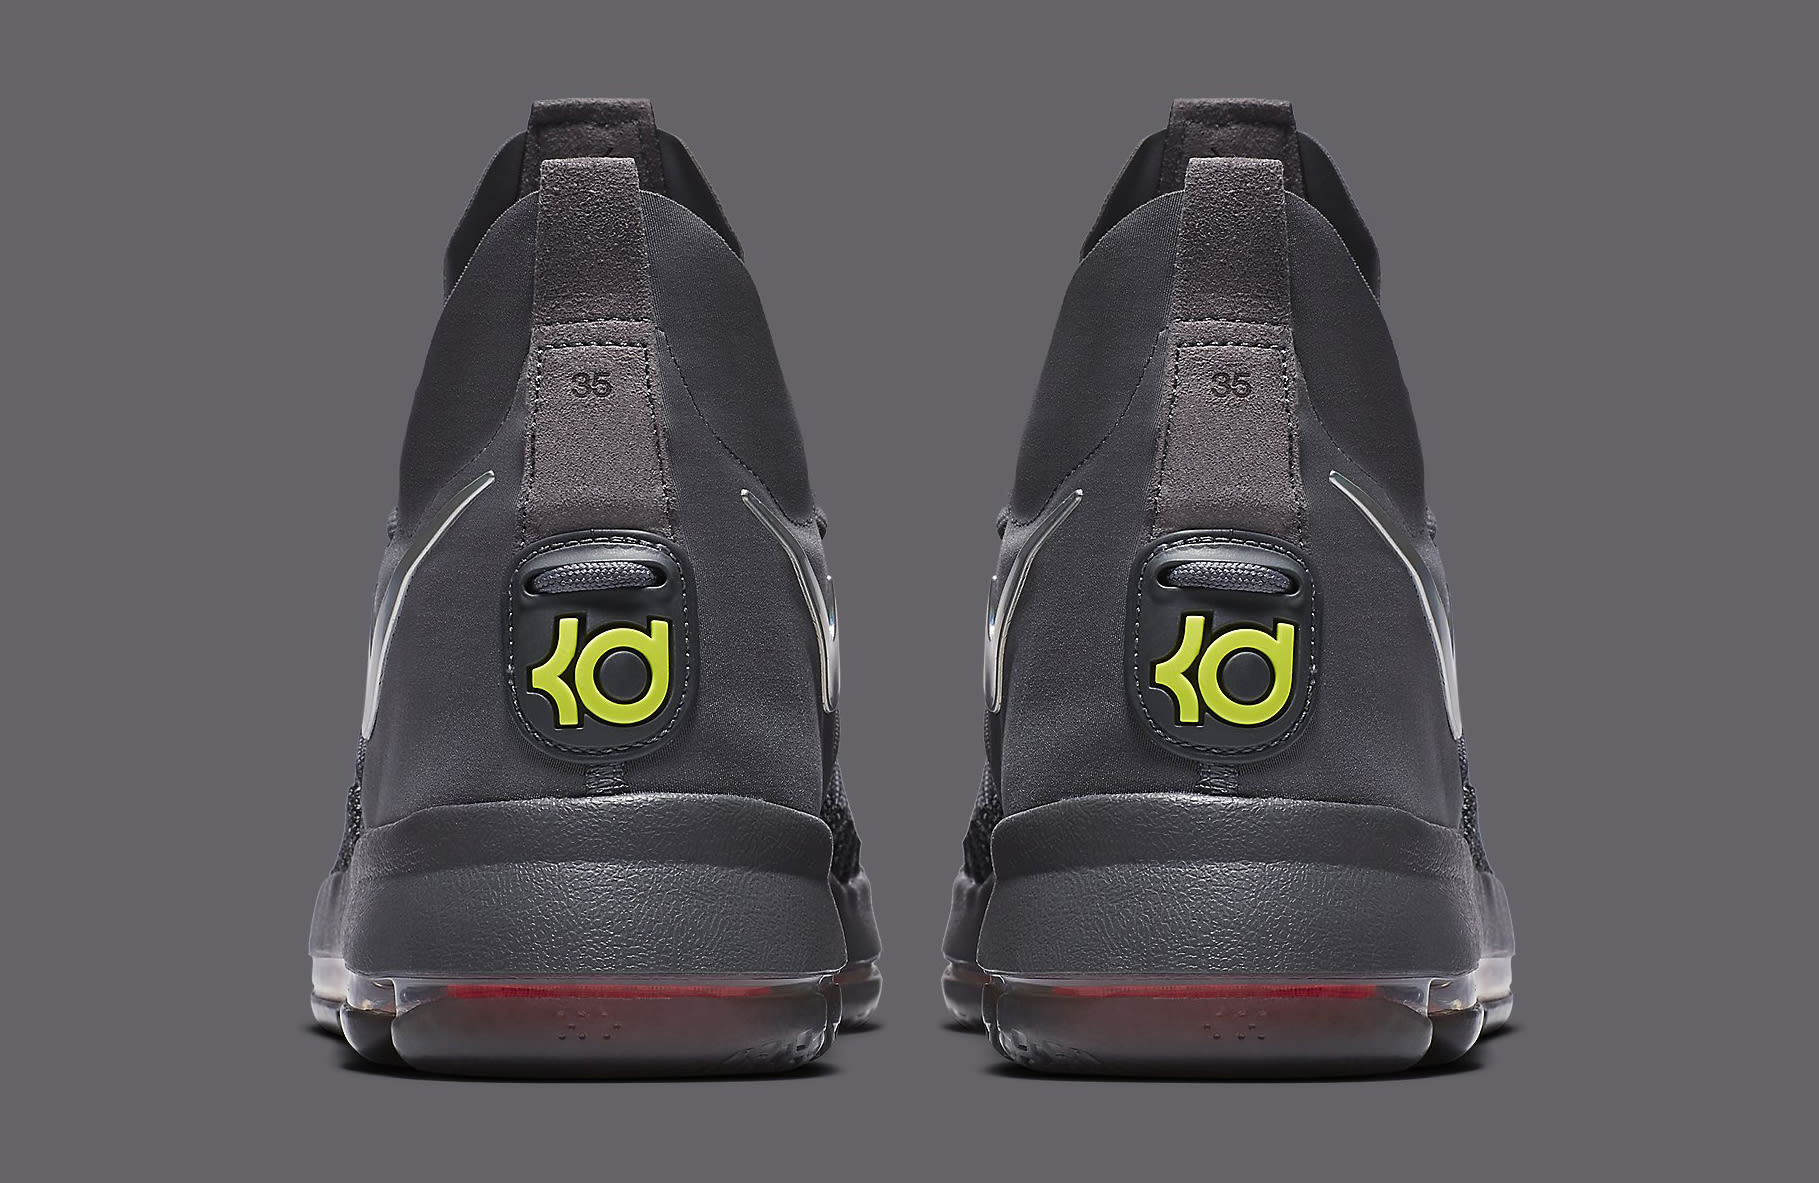 f01bb1972f298 Image via Nike Nike KD 9 Elite TS EP 909140-013 Grey Heel